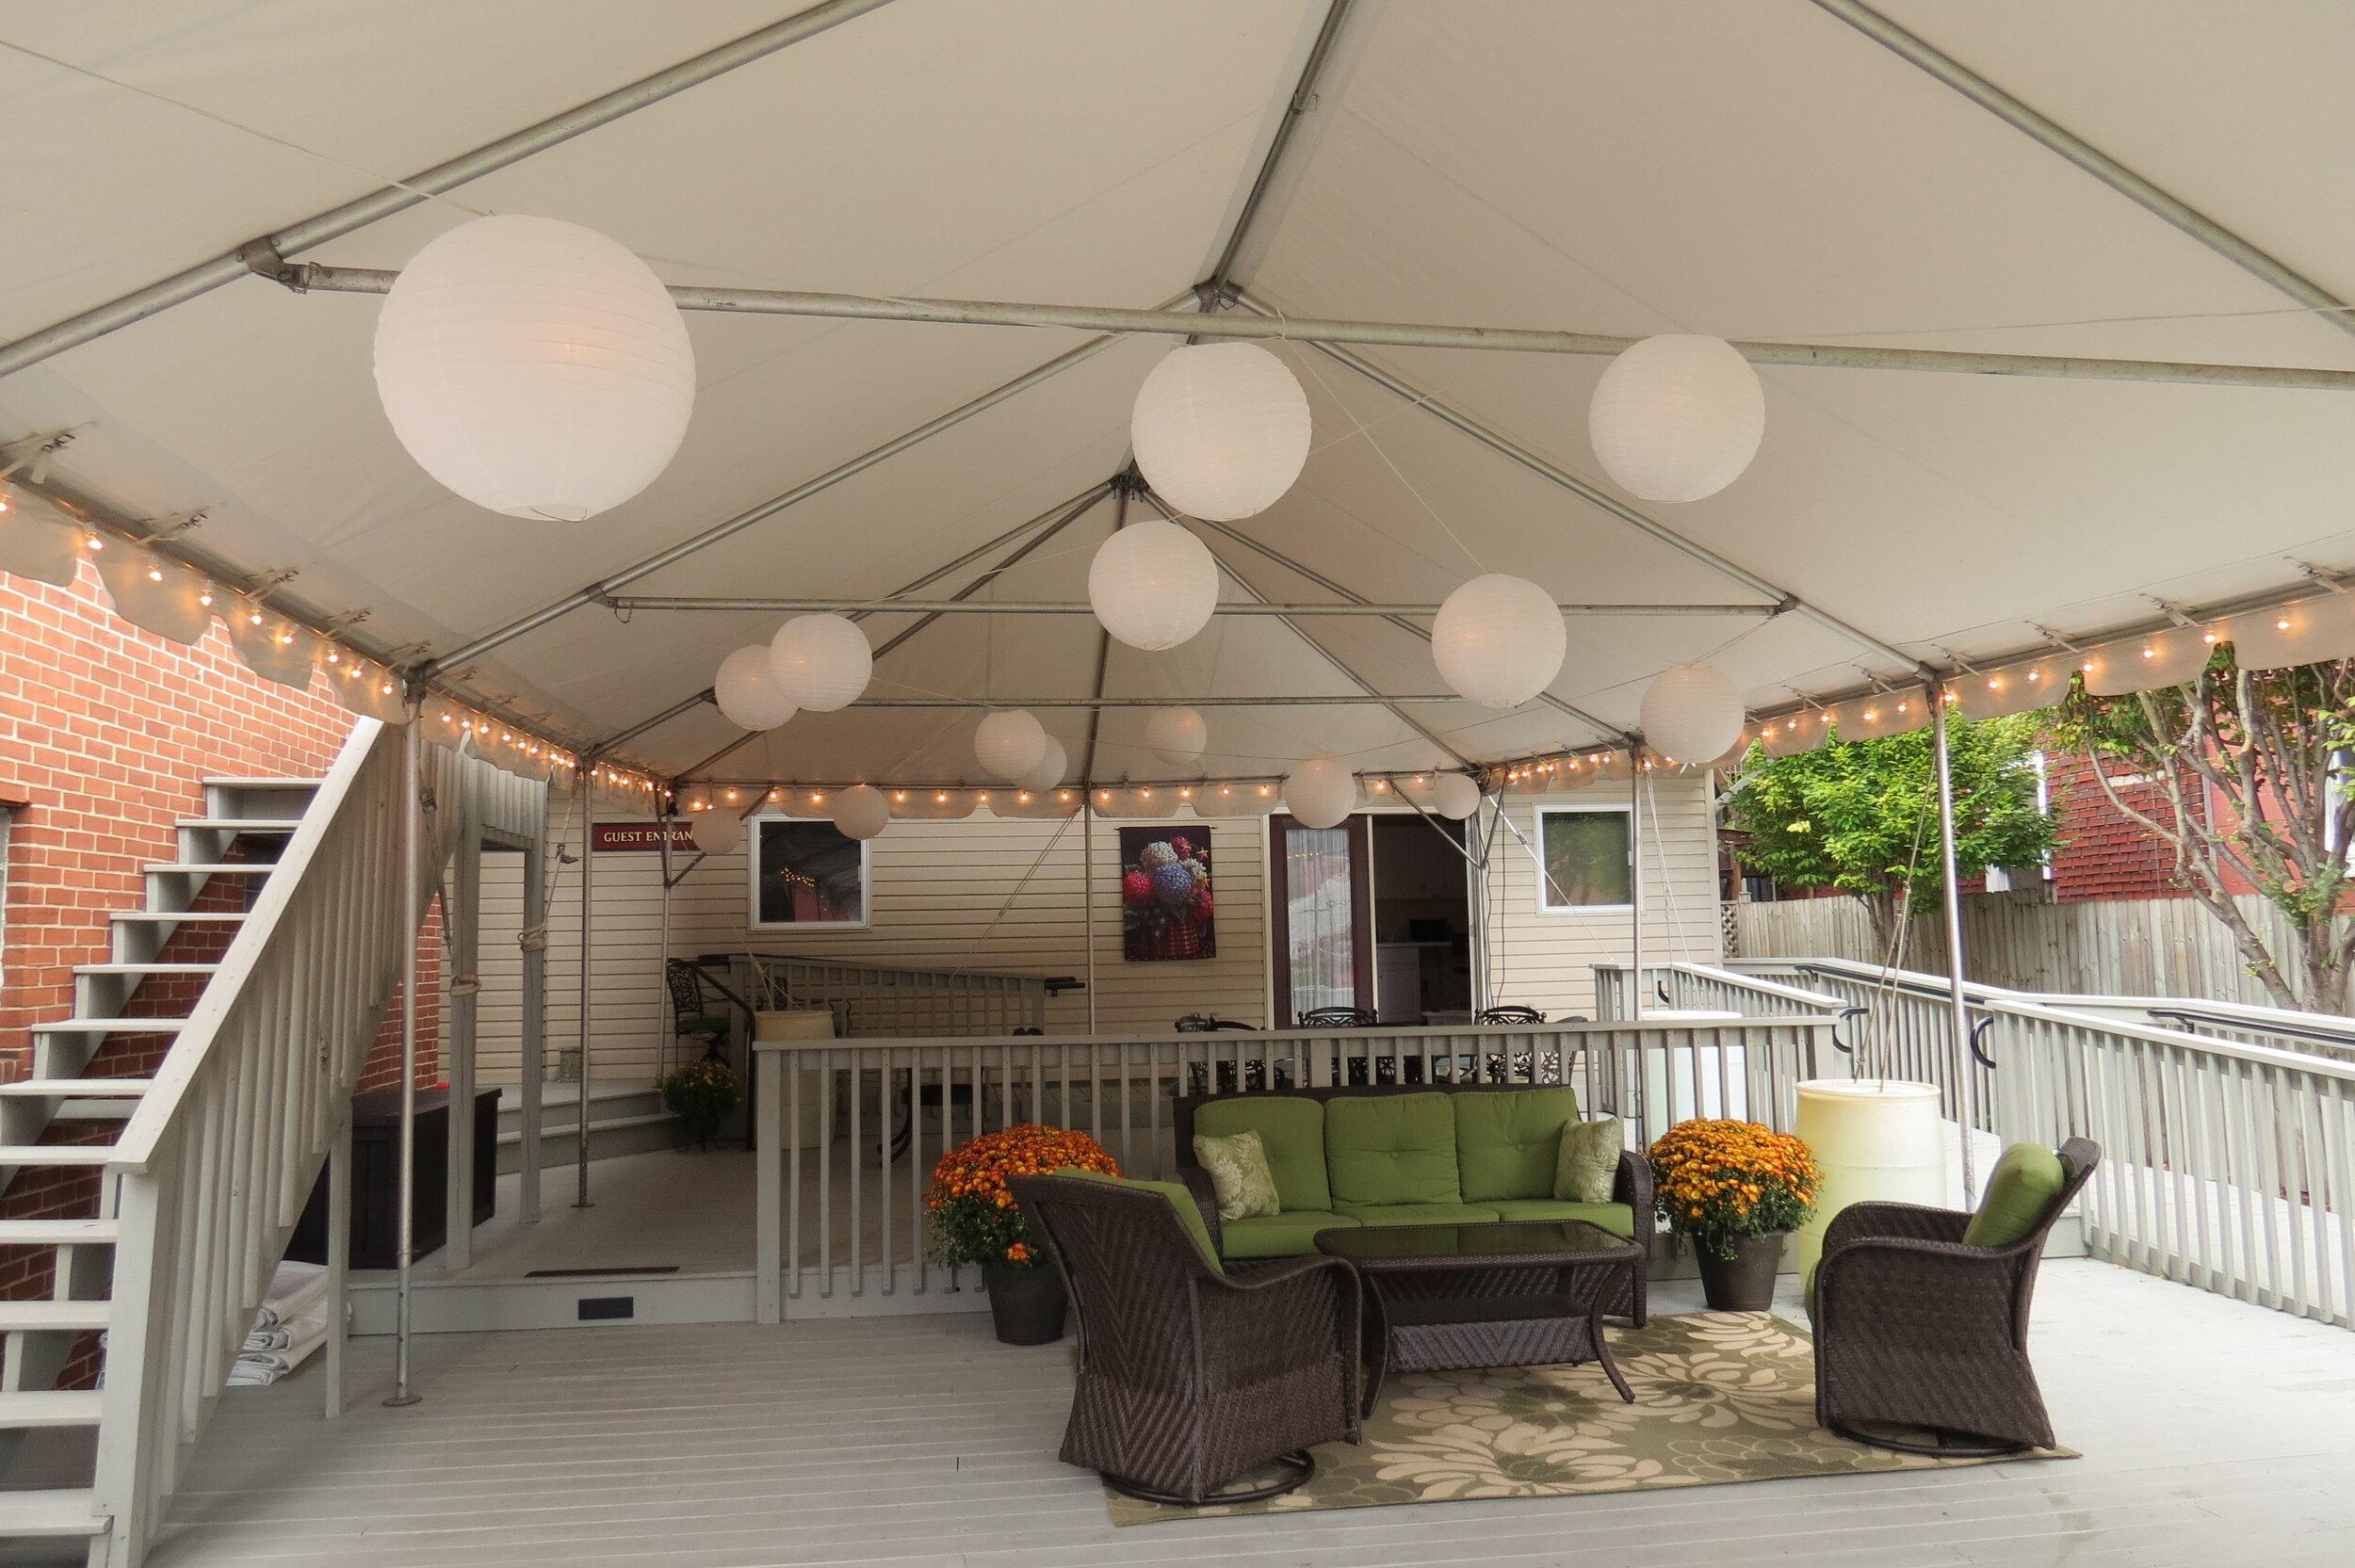 Wedding tent management